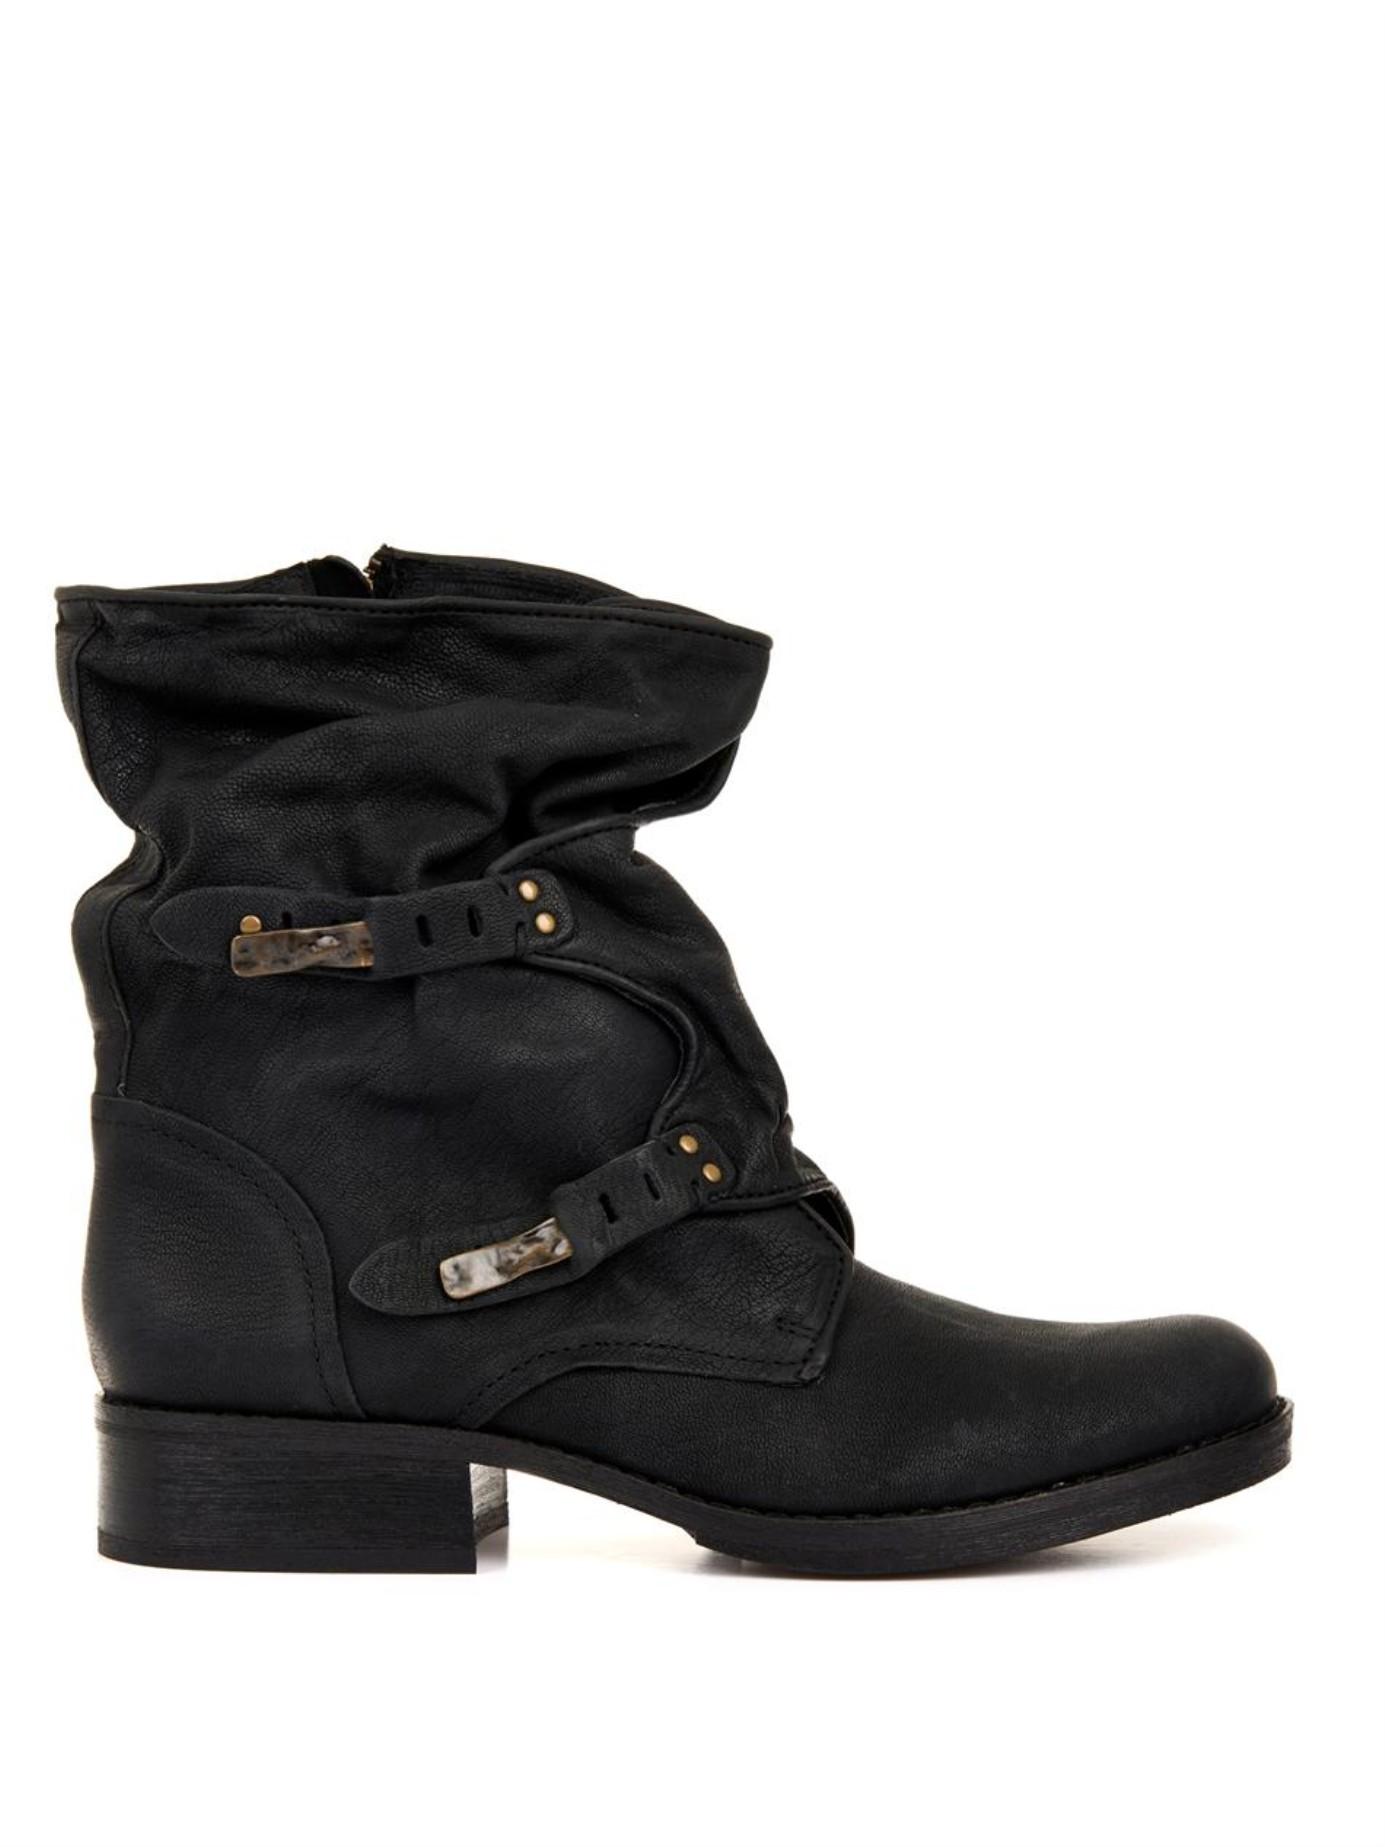 sam edelman ridge leather boots in black lyst